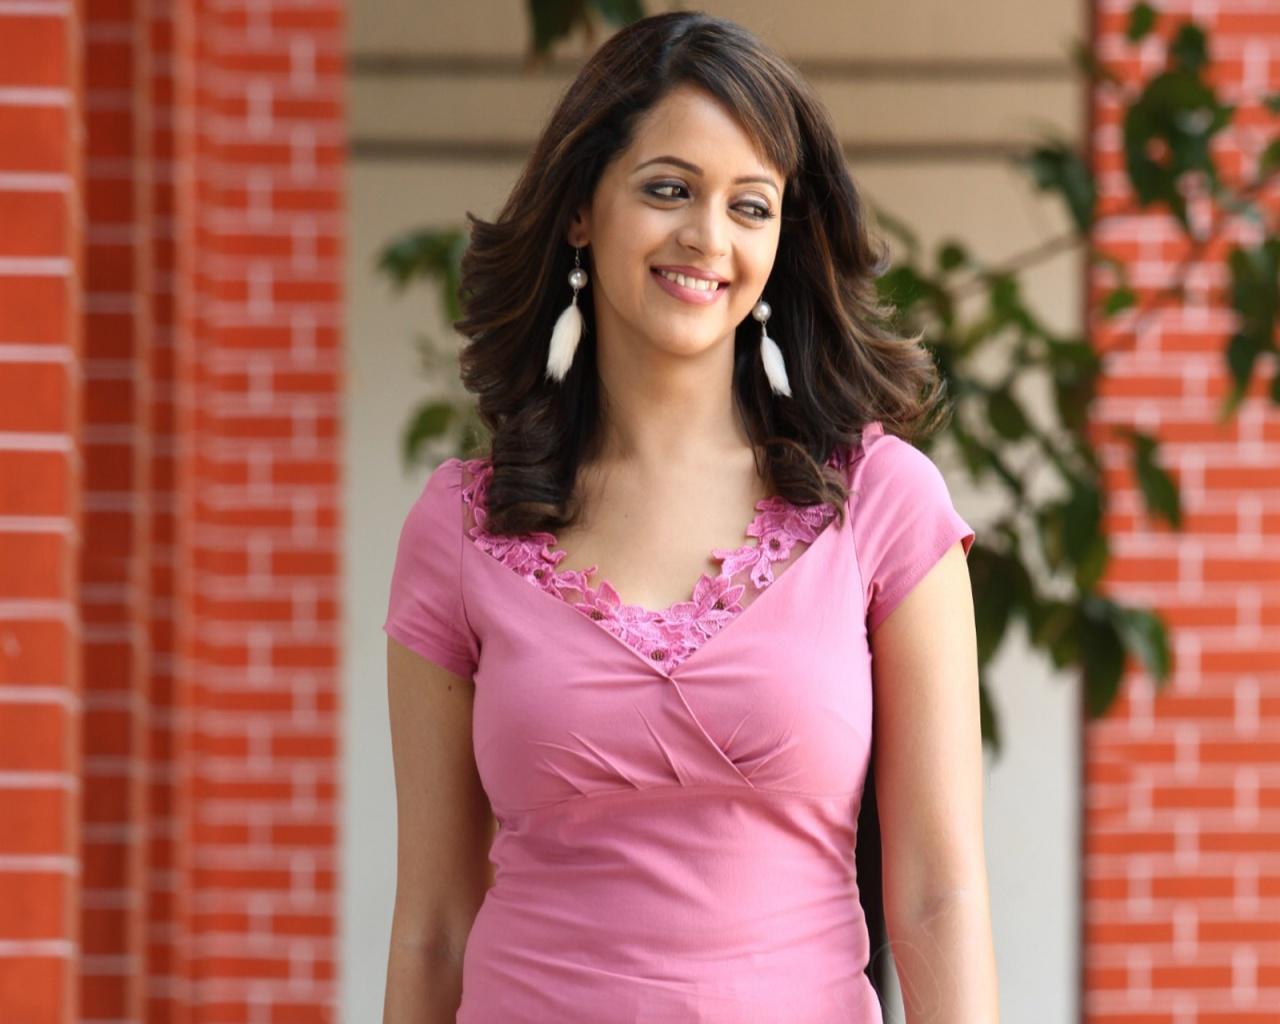 Telugu Actors Hd Wallpapers 53 Wallpapers: Tamil Actress HD Wallpapers